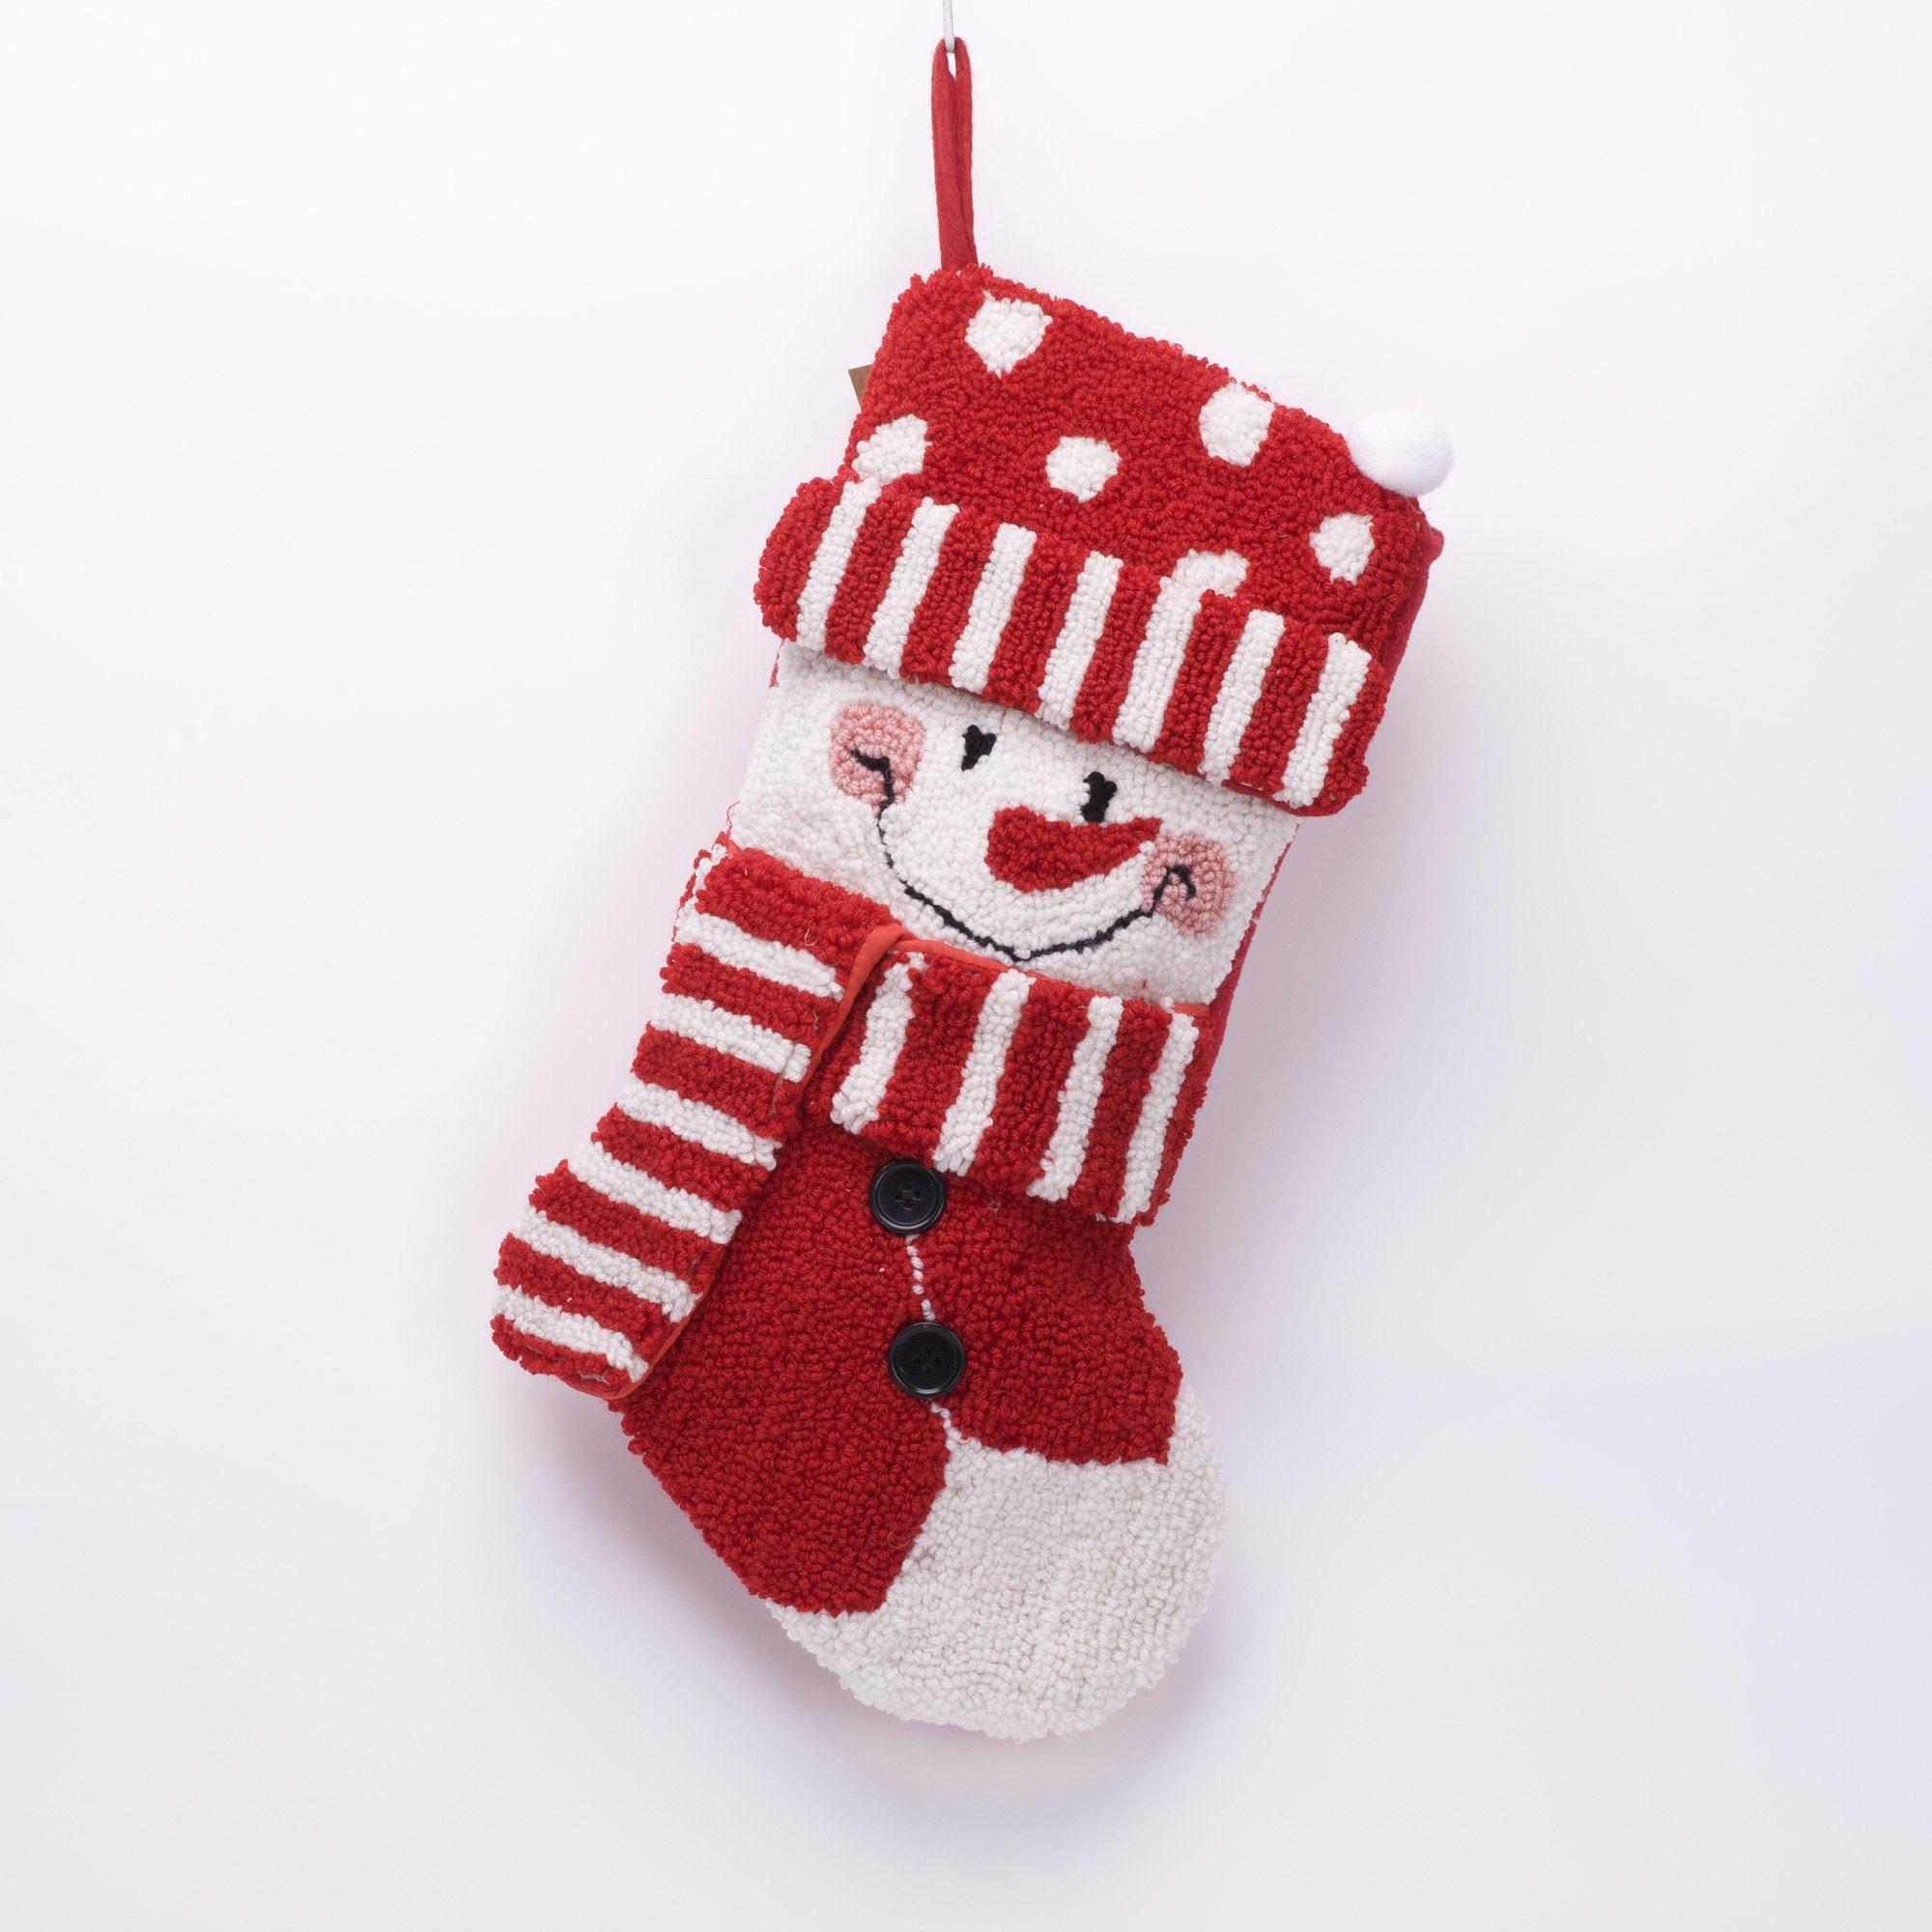 Glitzhome 20'' Handmade Hooked 3D Snowman Christmas Stocking